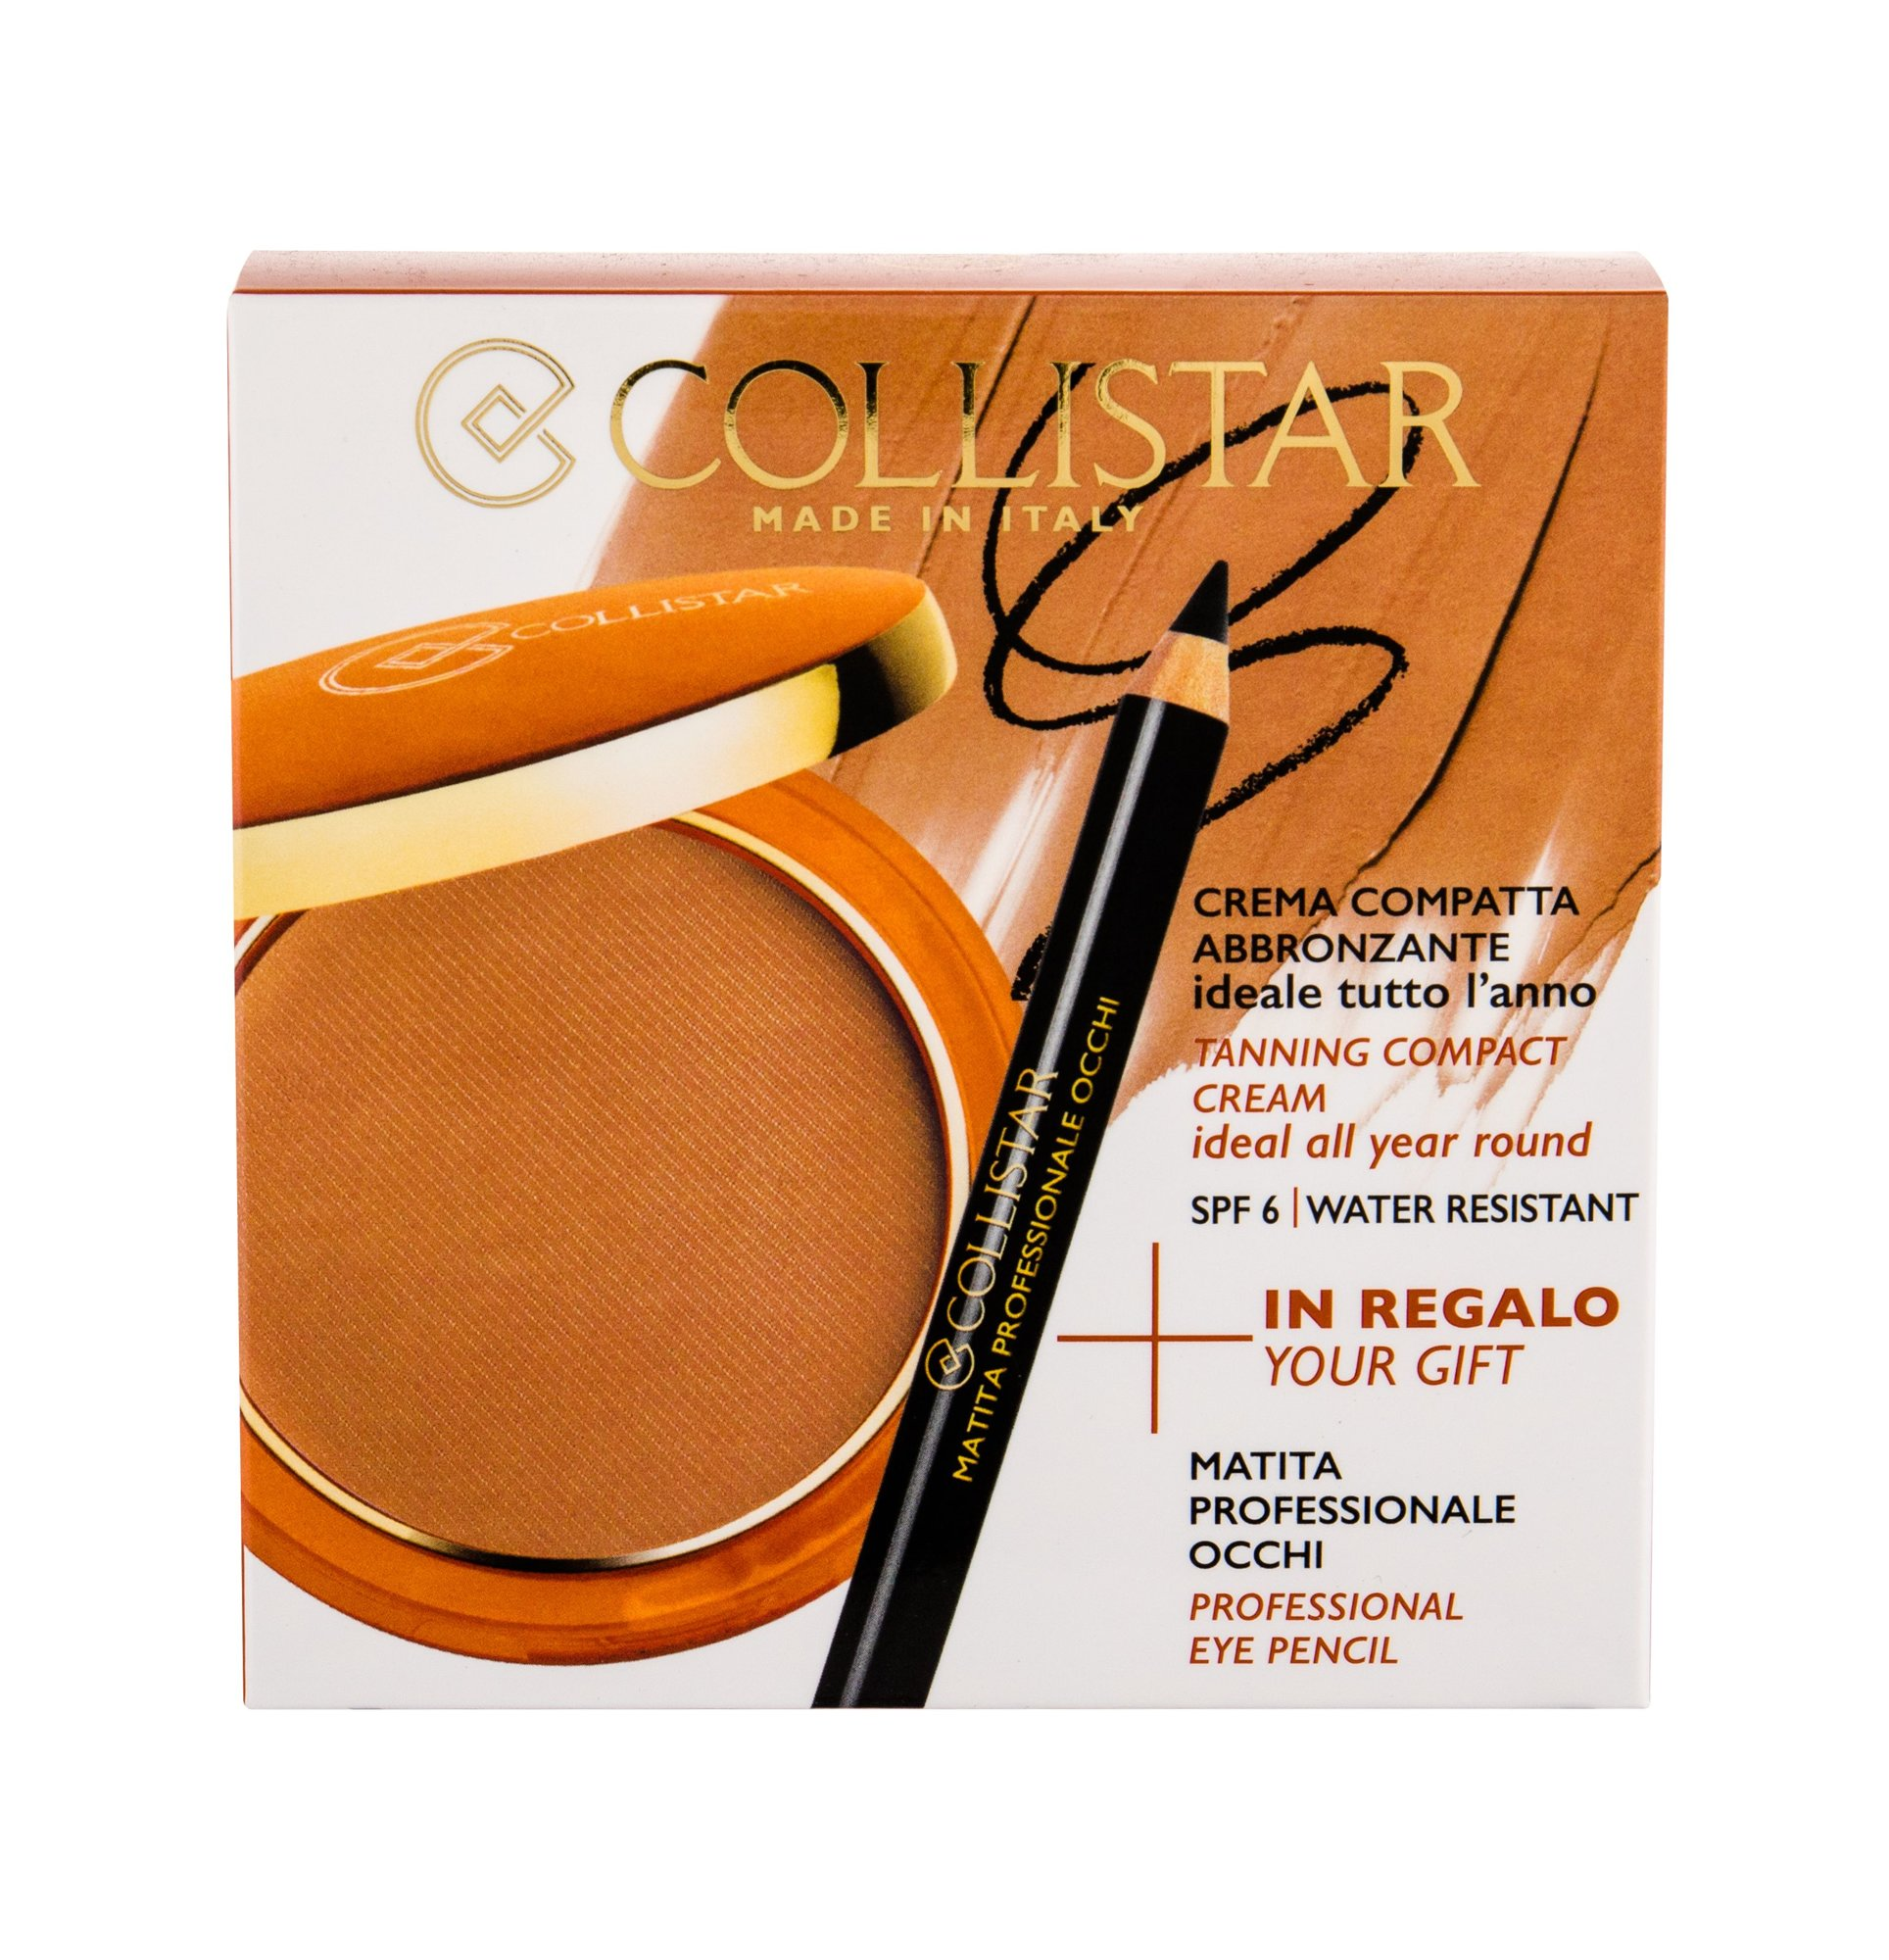 Collistar Tanning Compact Cream Powder 9ml 4 Caribbean